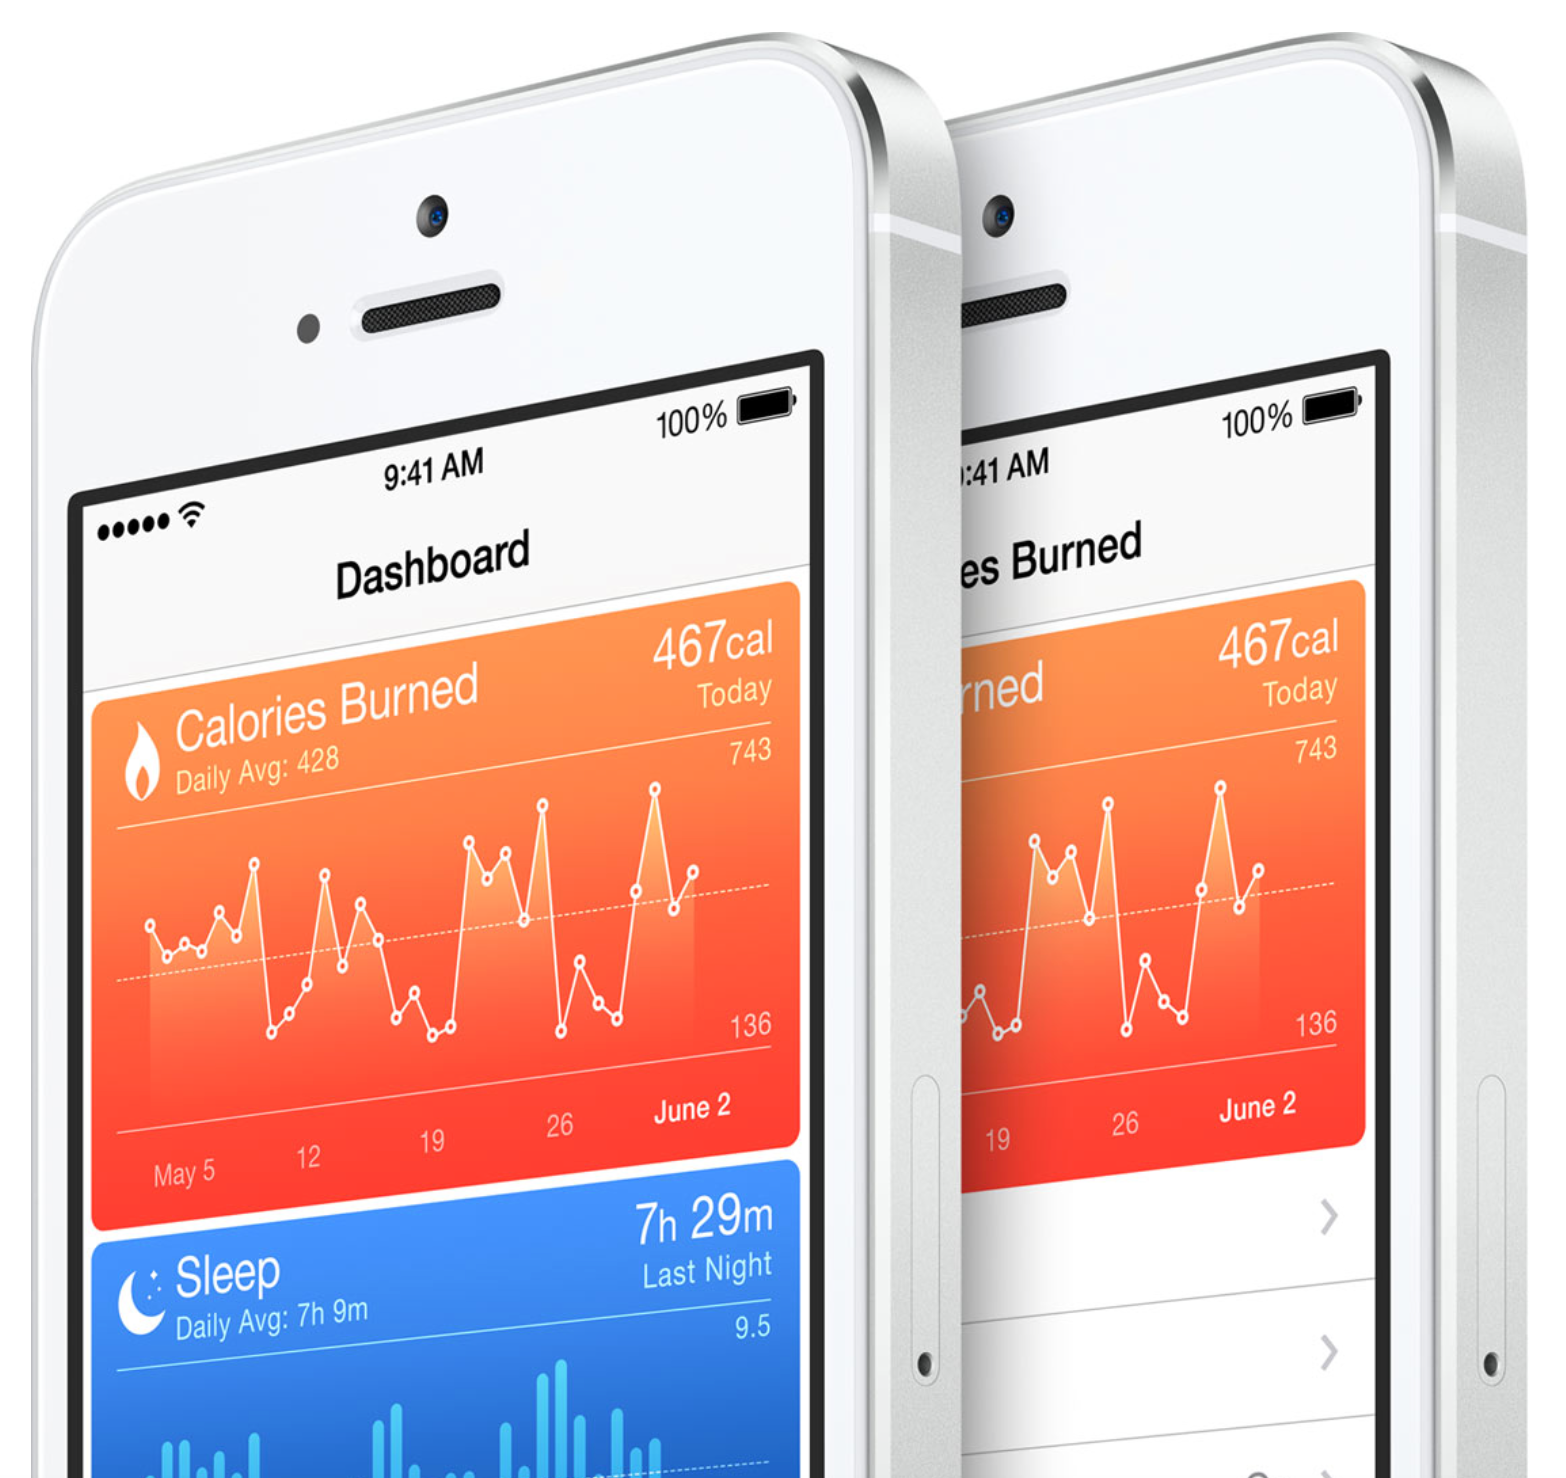 Health.app on iPhone